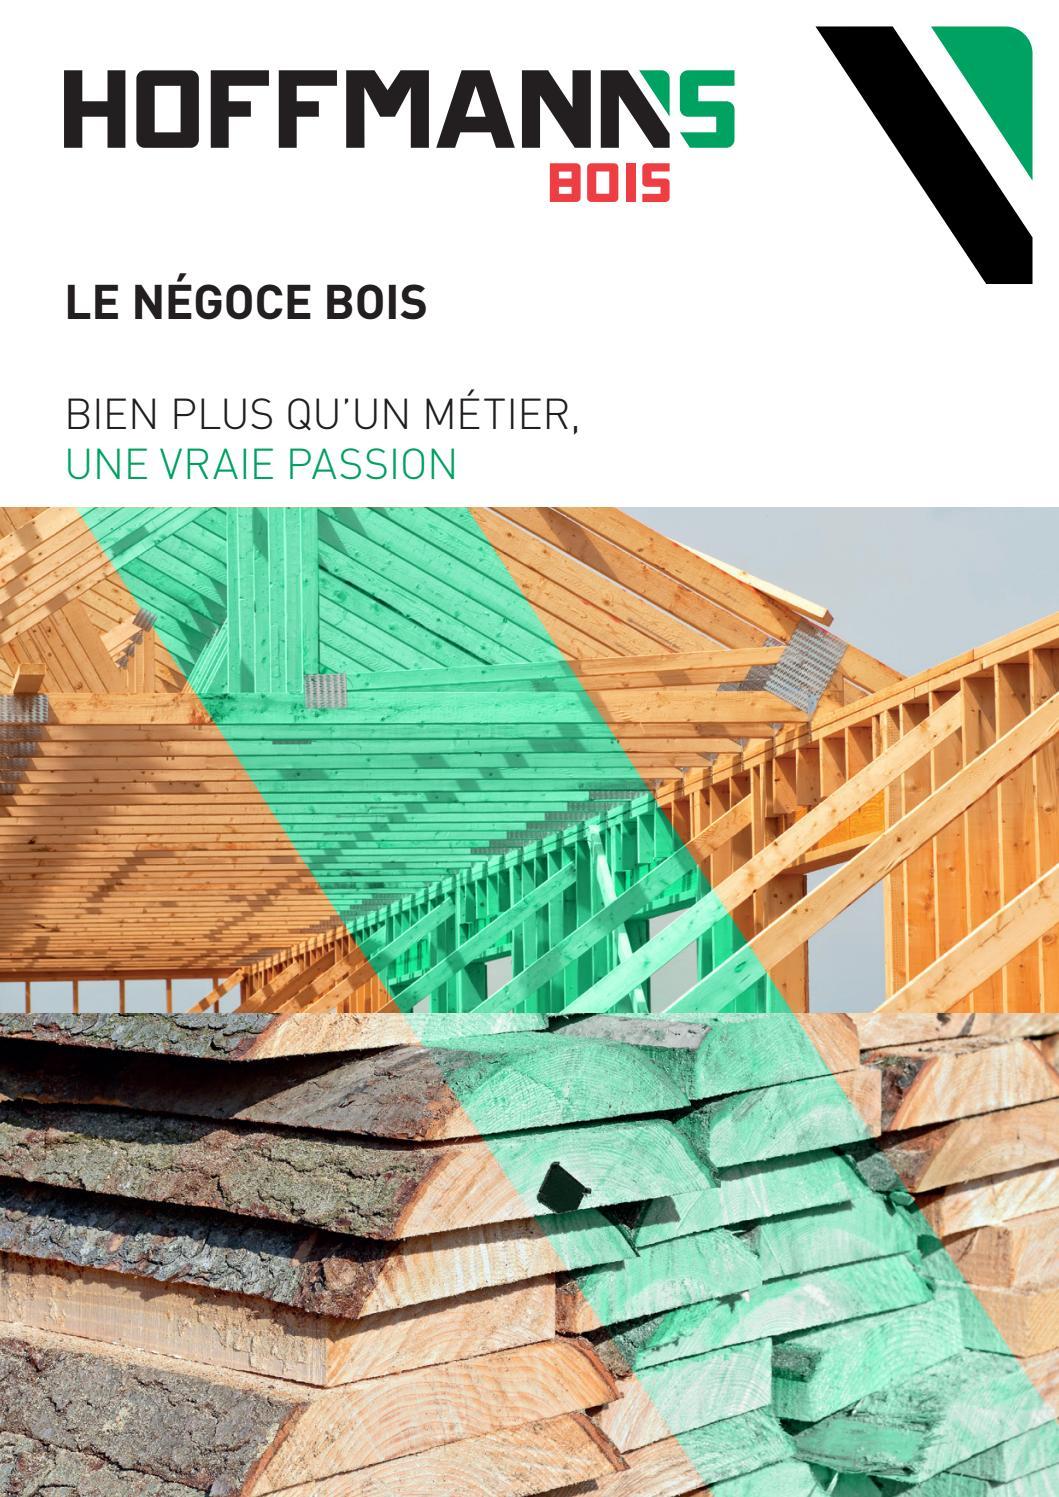 Plan De Travail Bois 280 hoffmann's bois - frmikado plus - issuu